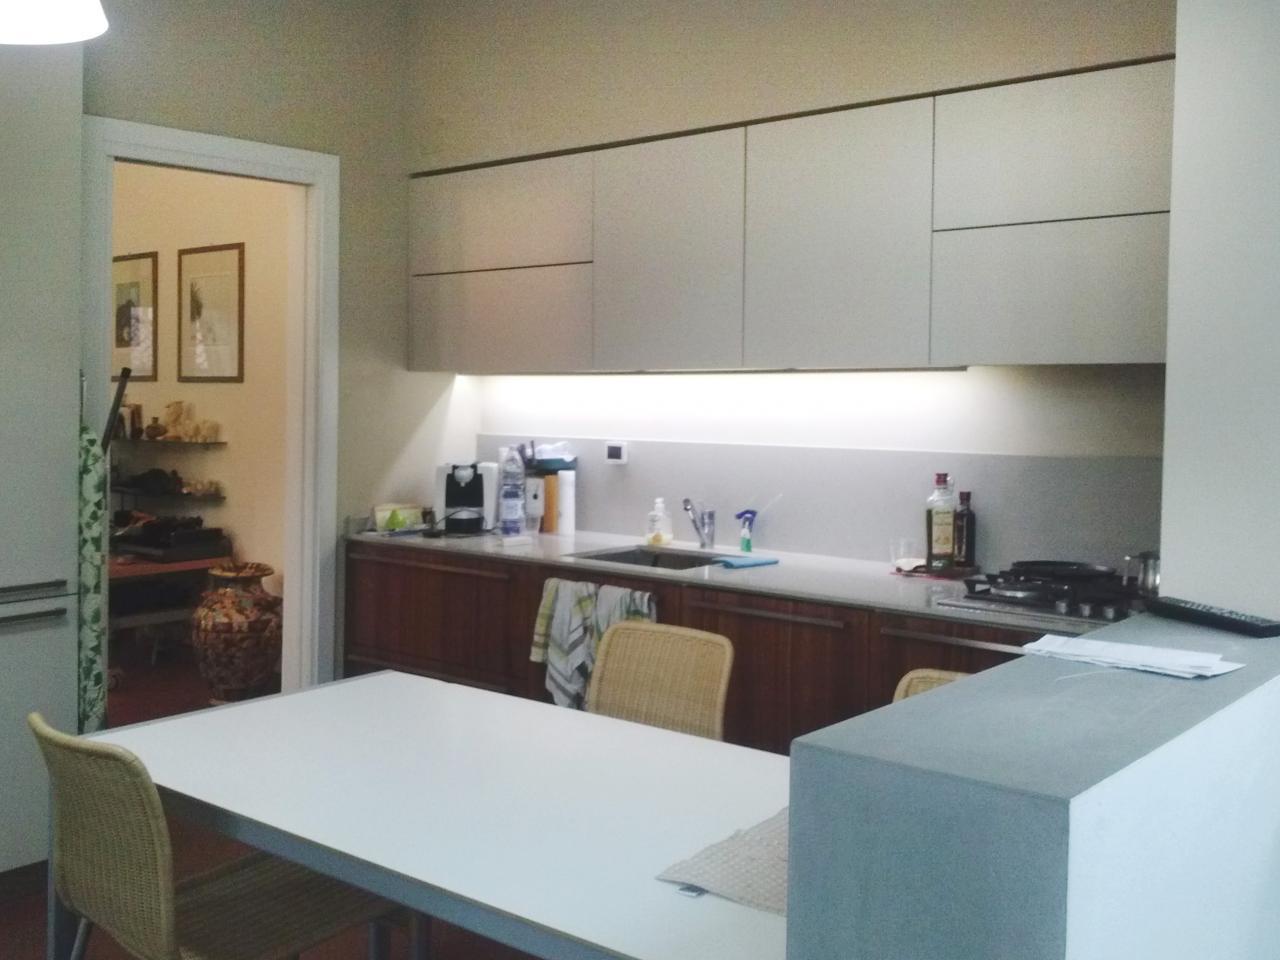 Villetta bifamiliare/Duplex in vendita, rif. 200